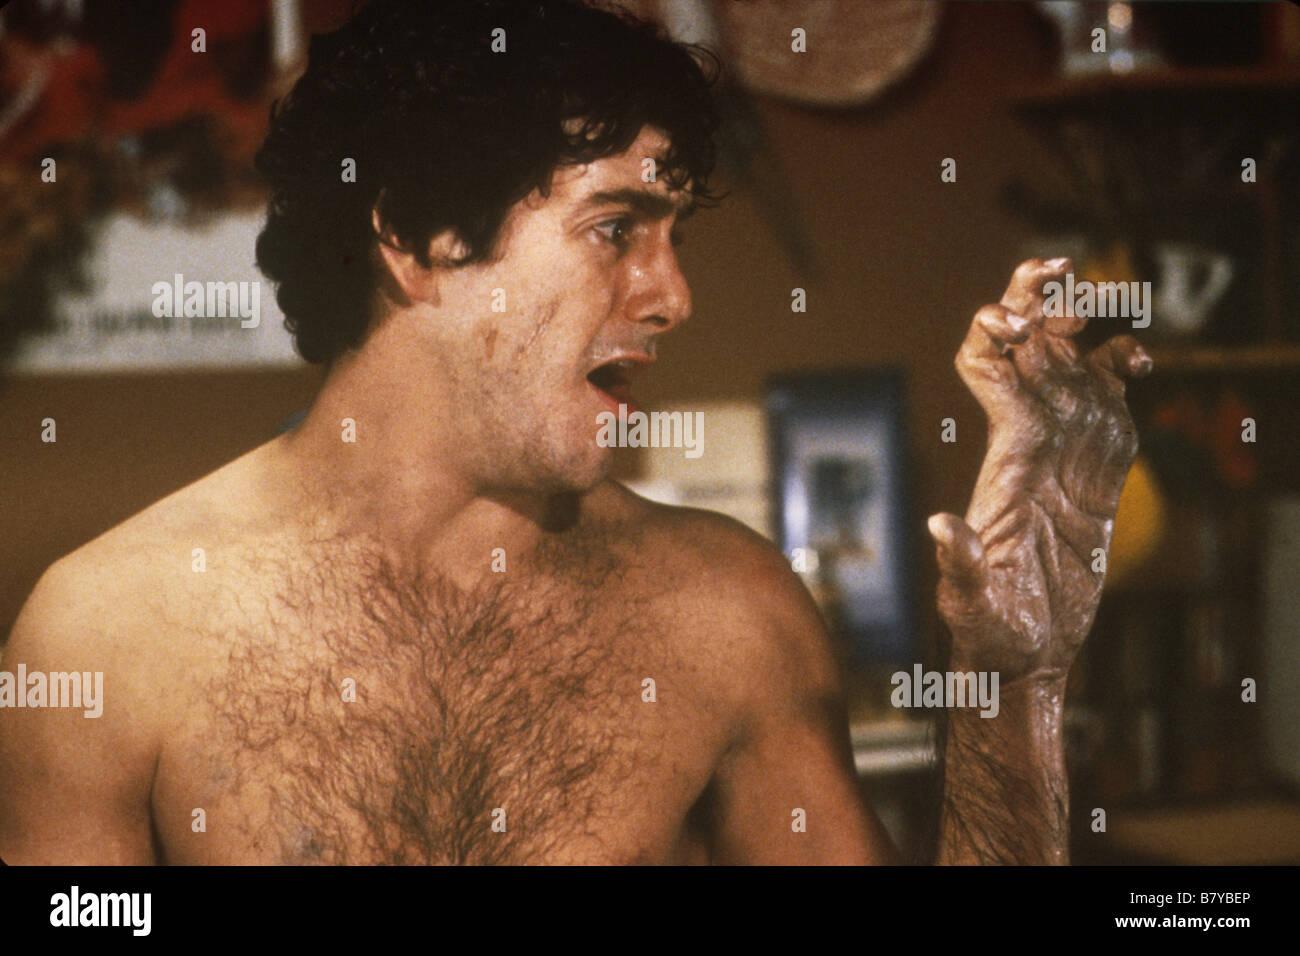 David naughton american werewolf in london